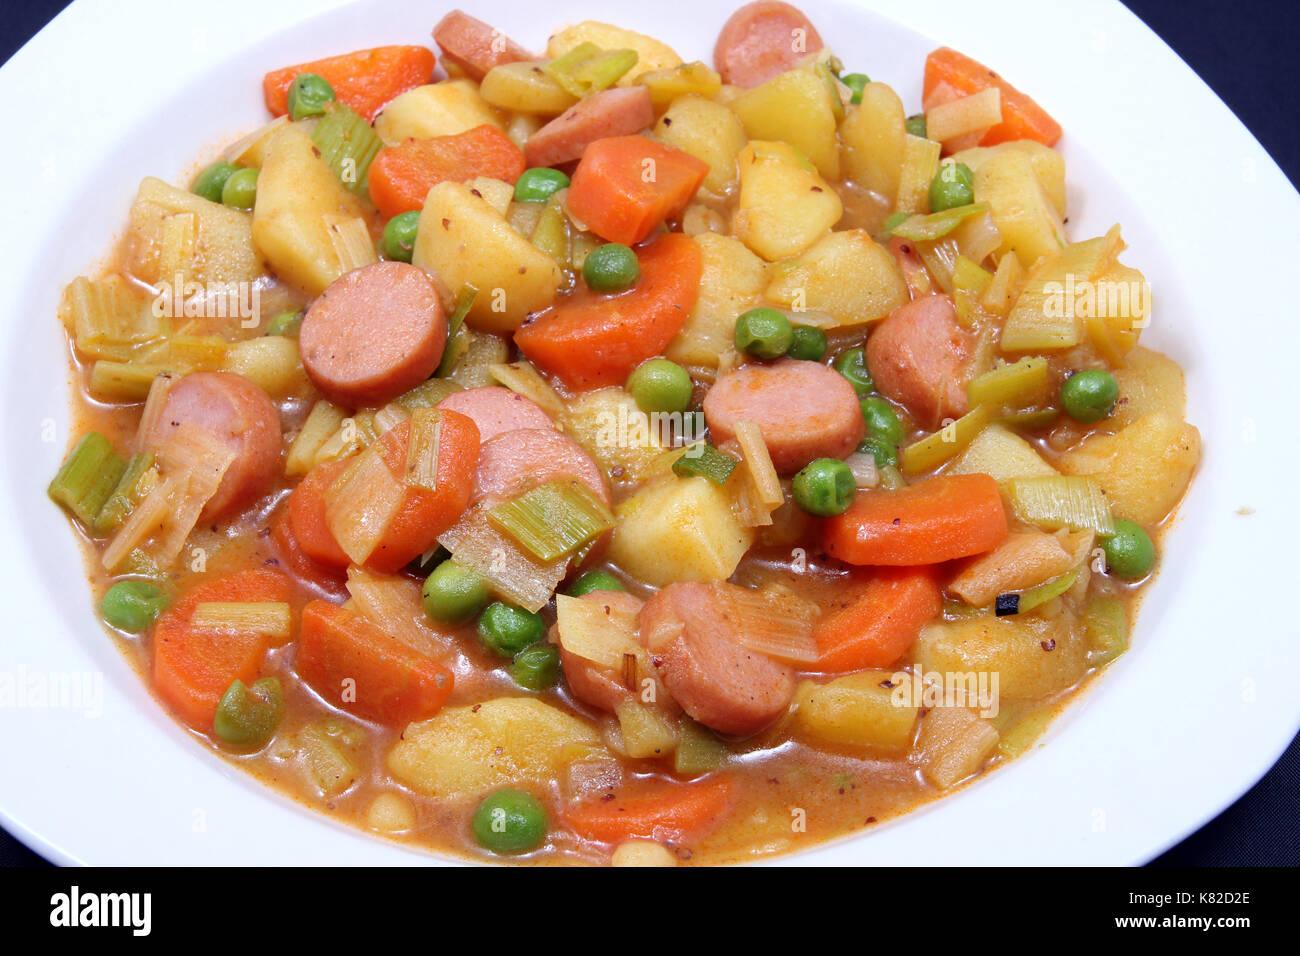 kartoffeleintopf mit bohnen auf weißen teller, potato stew with beans on white plate Stock Photo